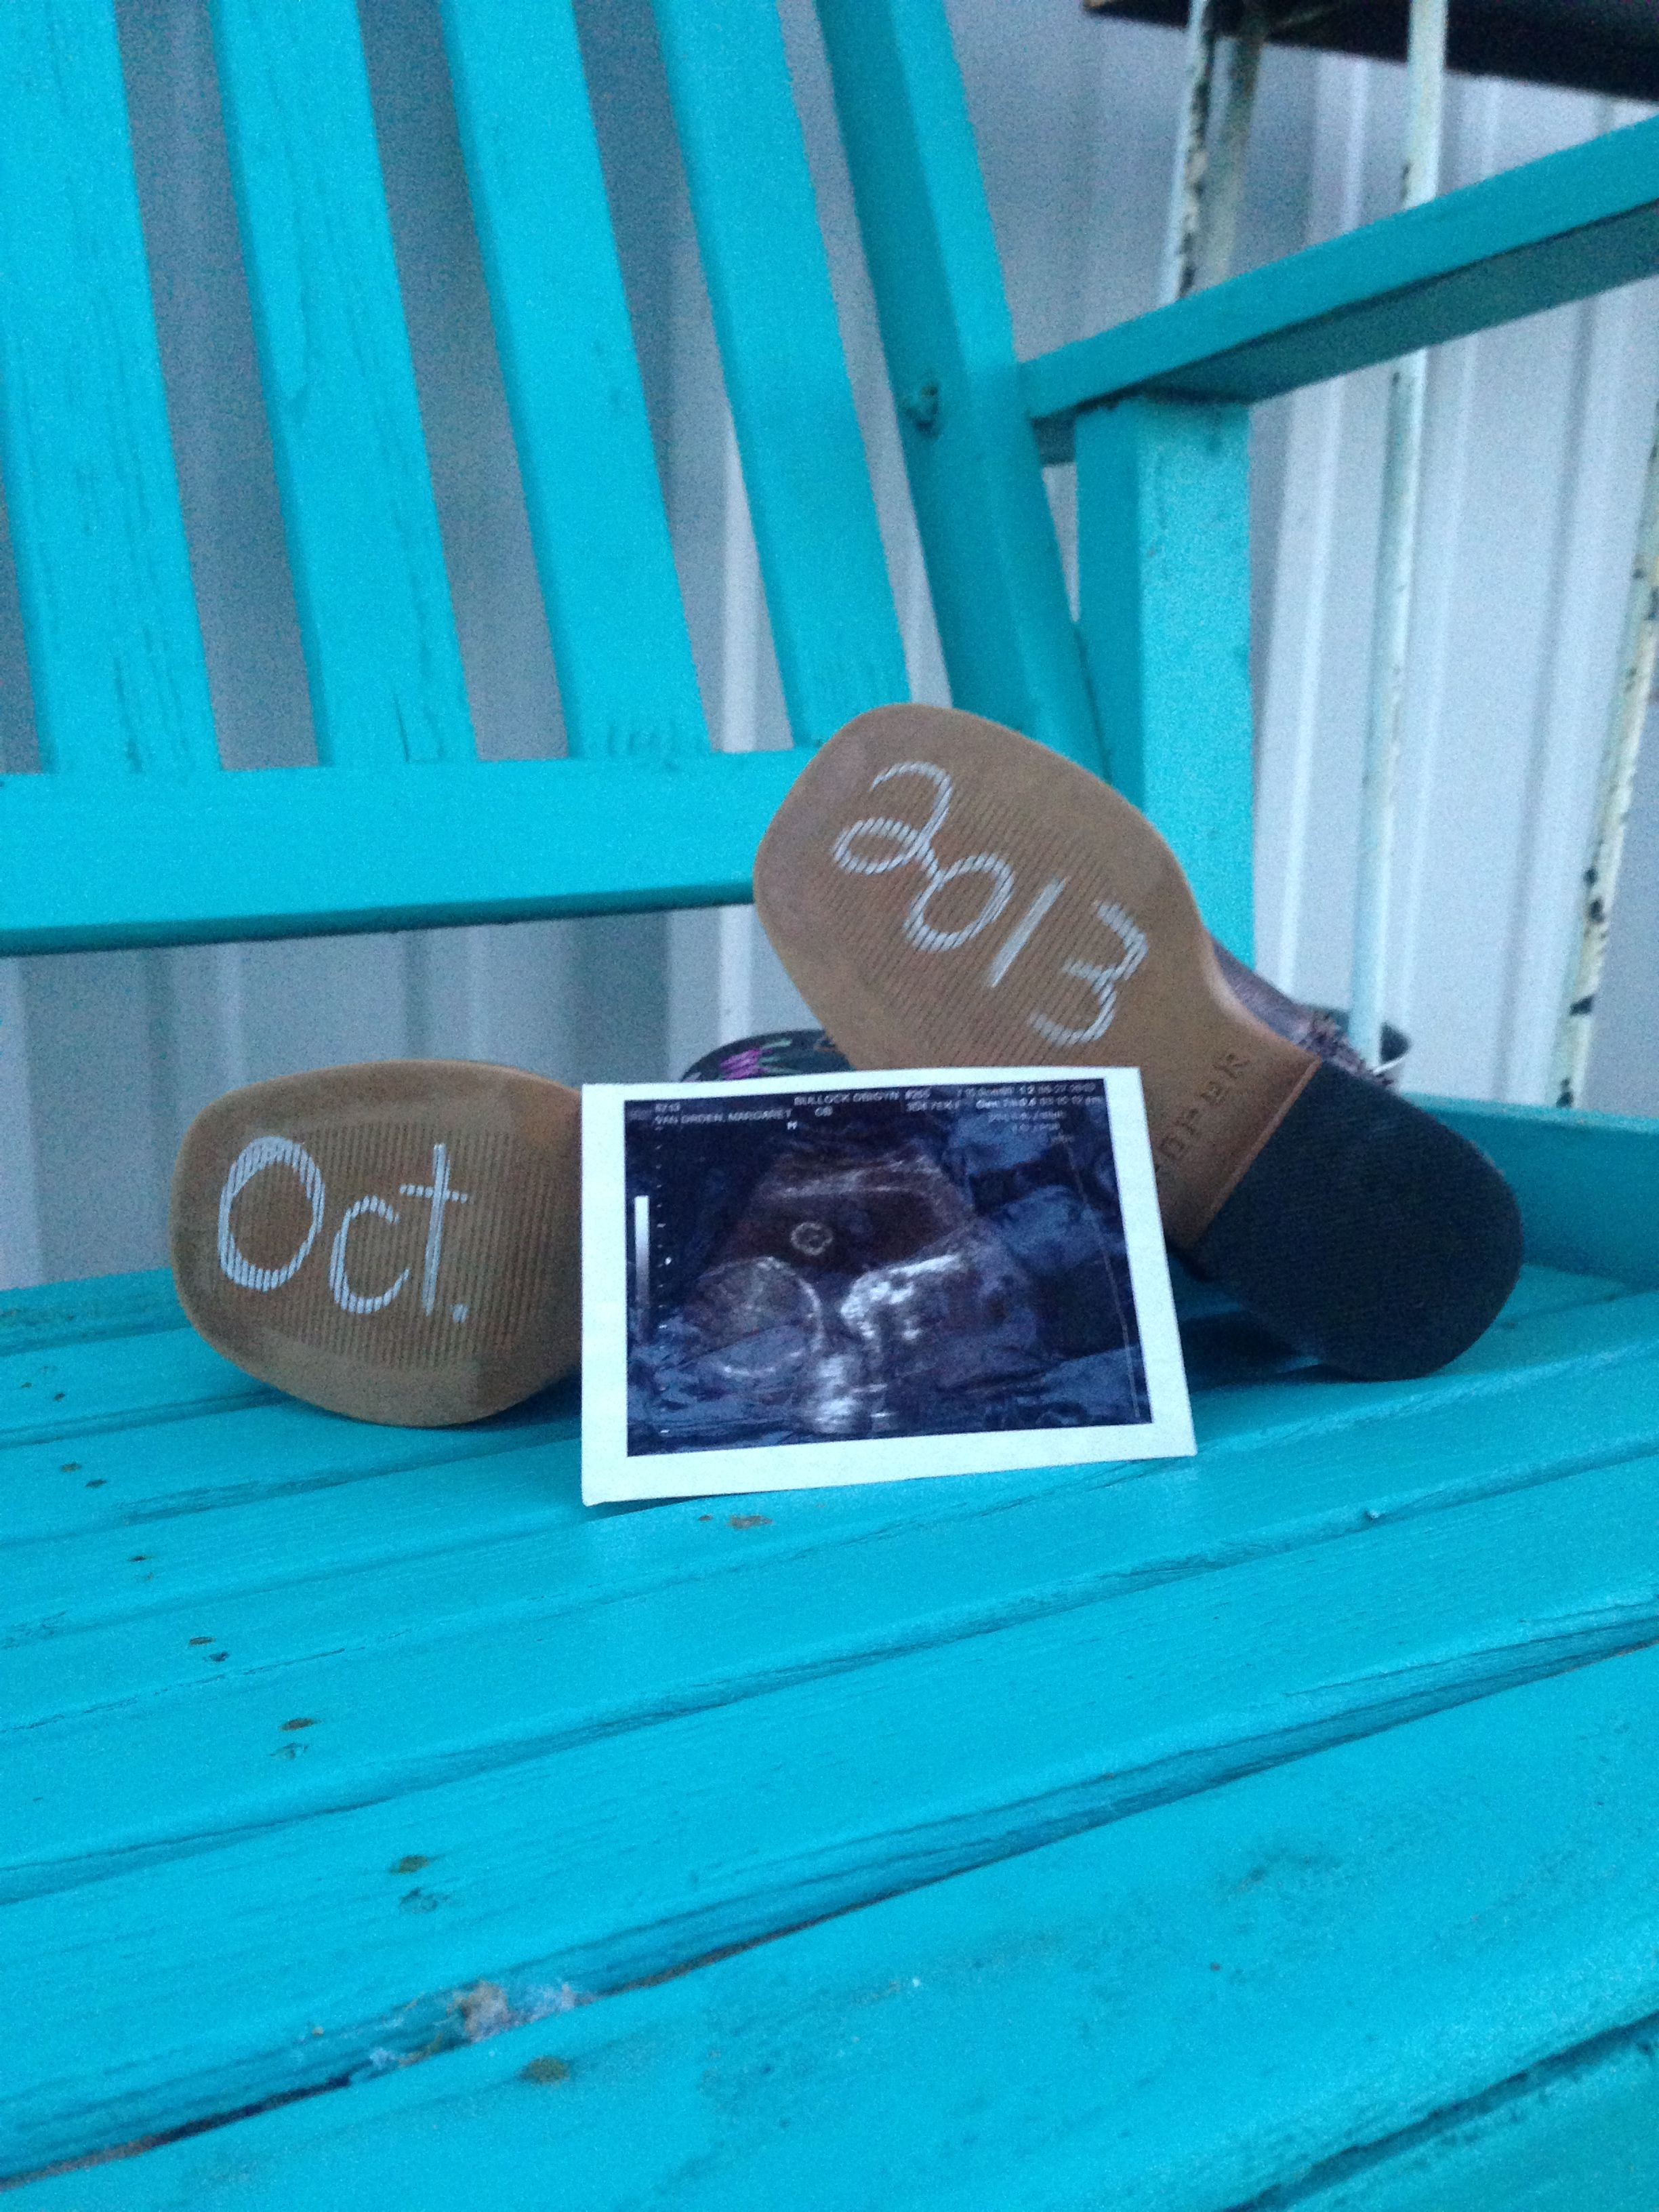 Baby Announcements haha @Christina Childress Childress & Ludke-Burica